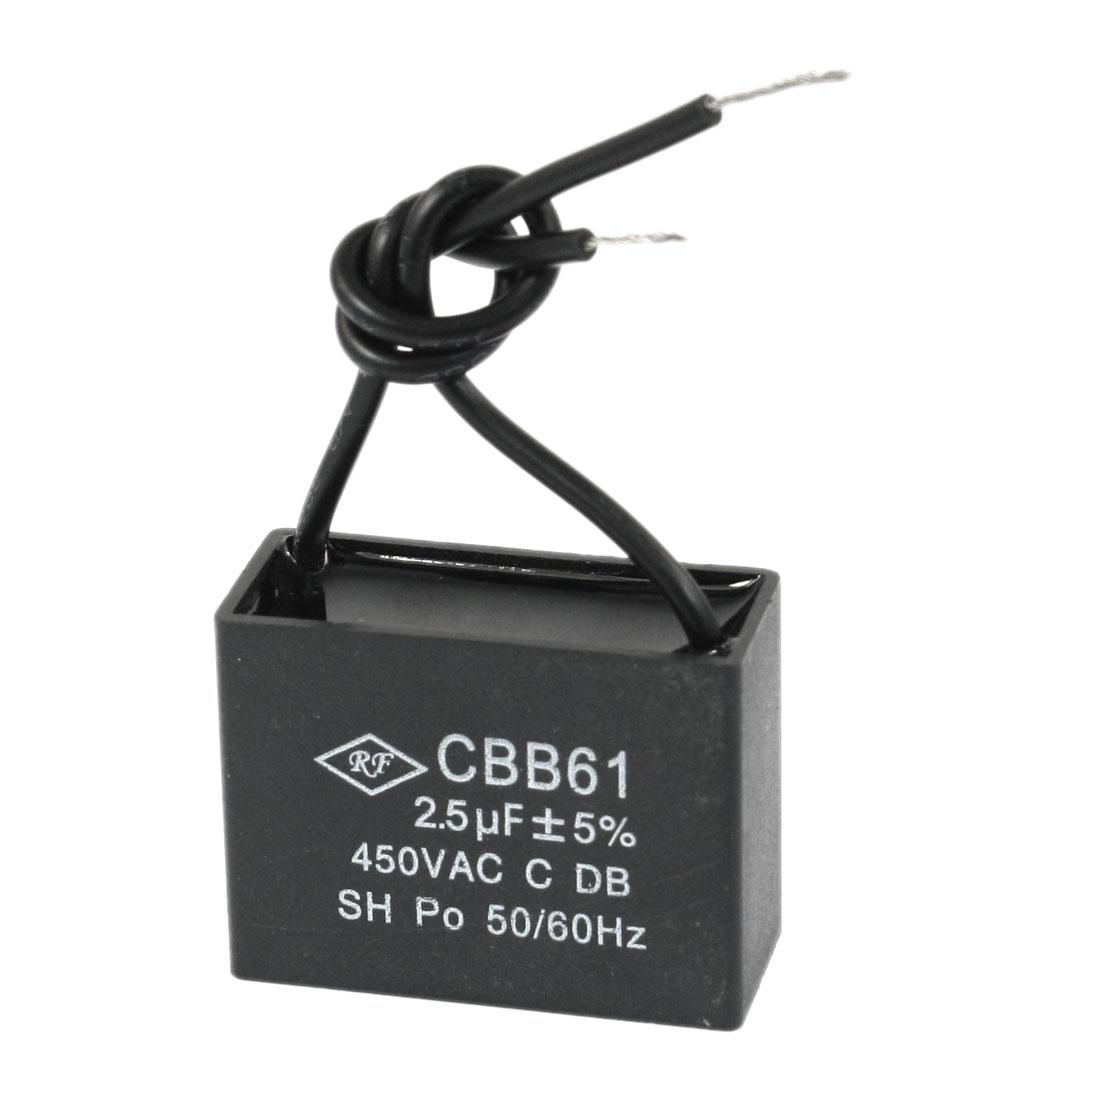 AC 450V 50/60Hz 2.5uF Rectangle Ceiling Fan Running Capacitor CBB61 Black